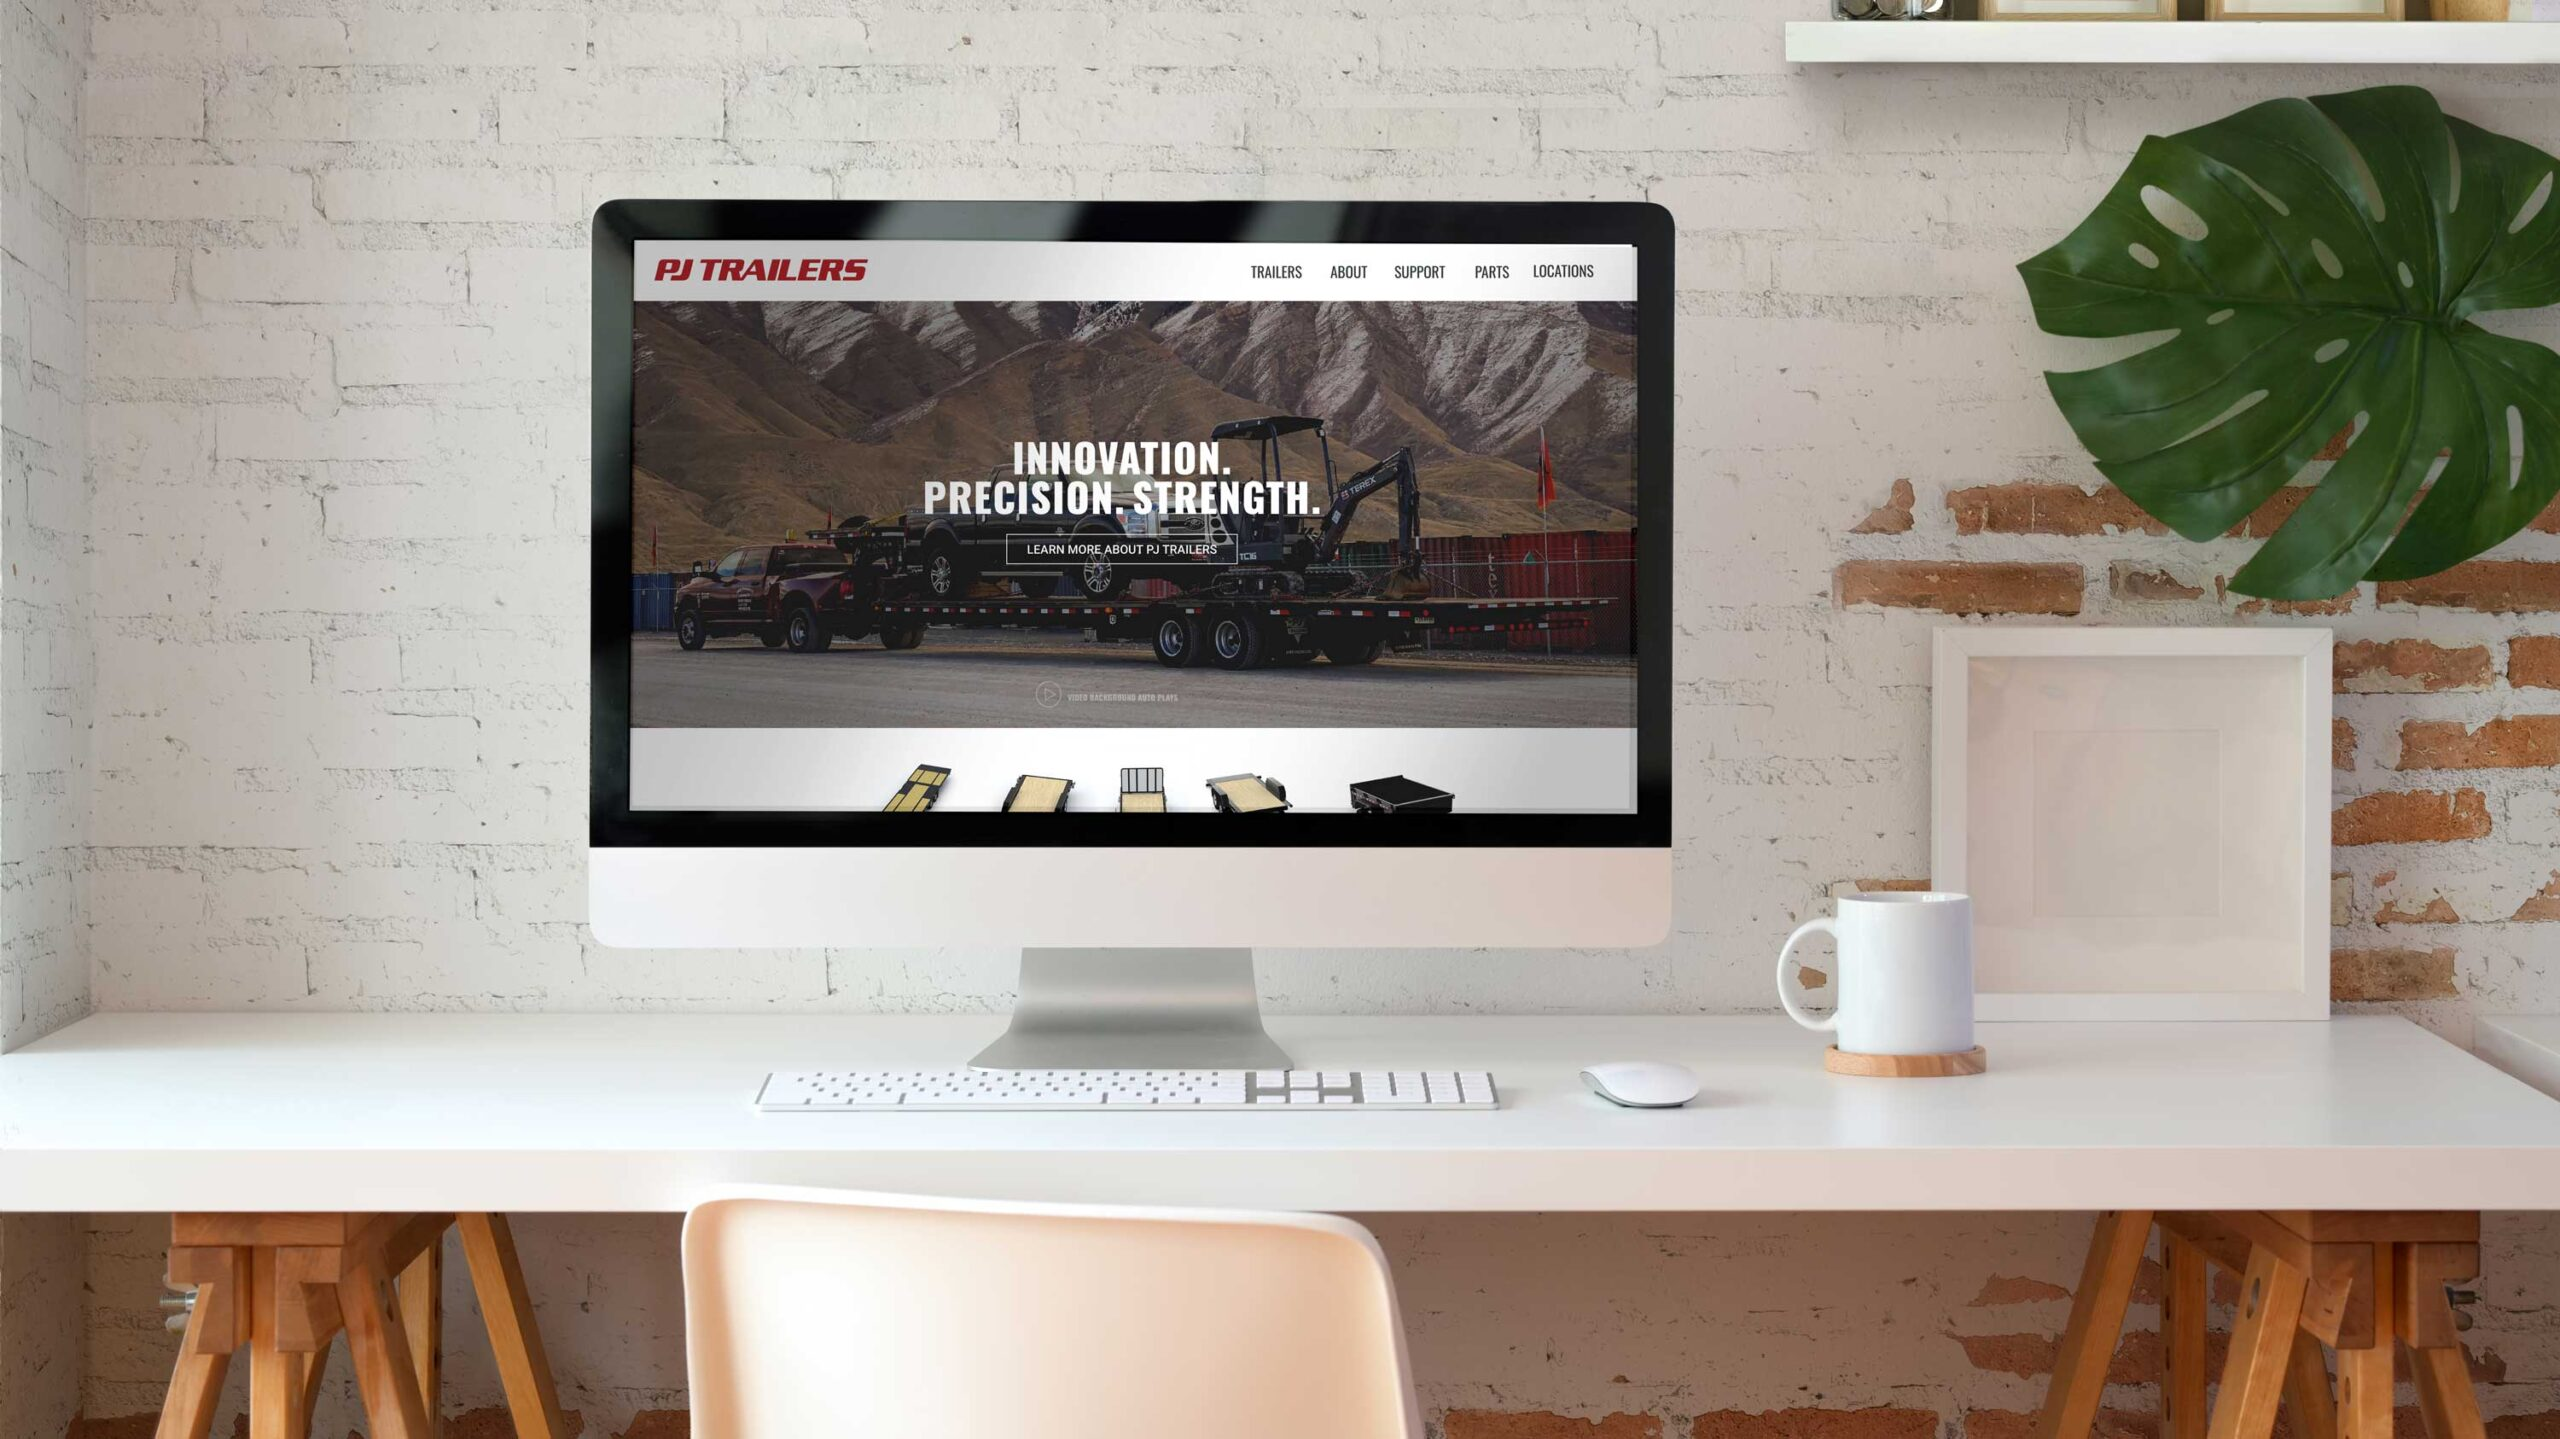 Desktop computer displaying the PJ Trailers website